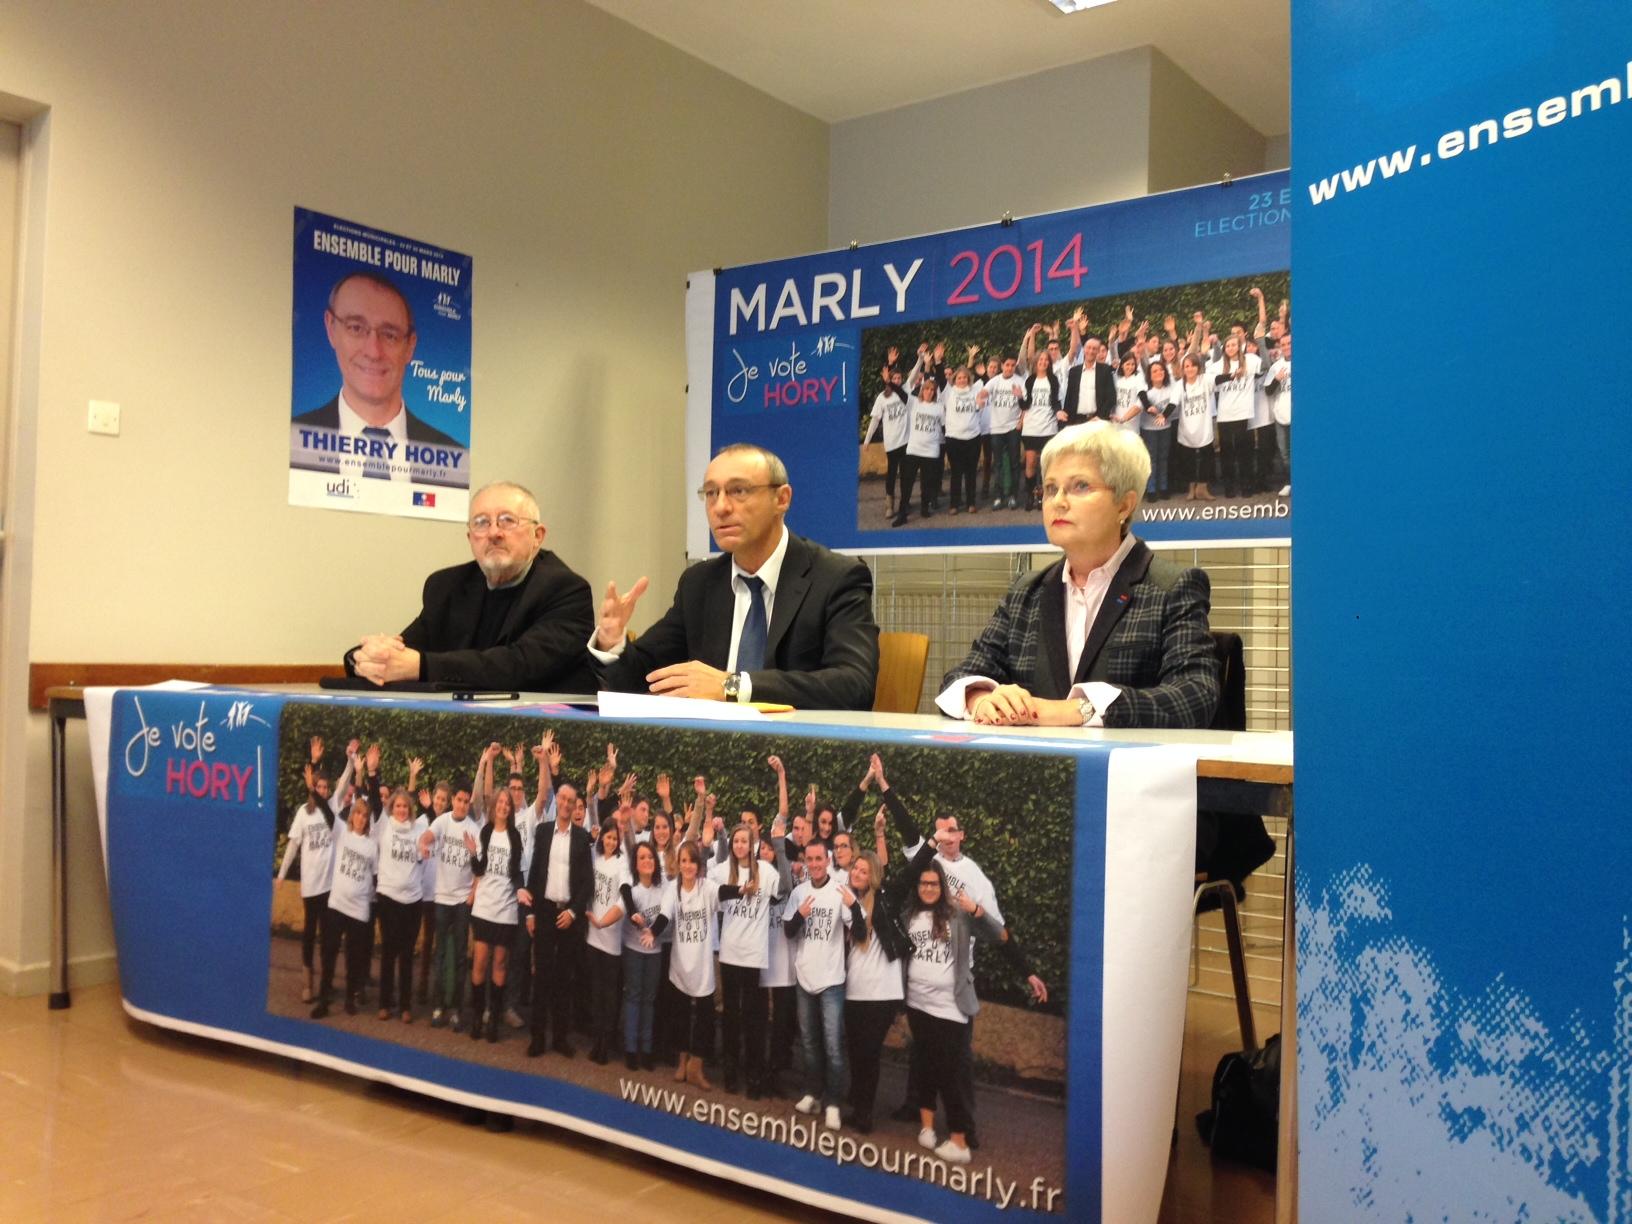 conference-presse-31janvier2014